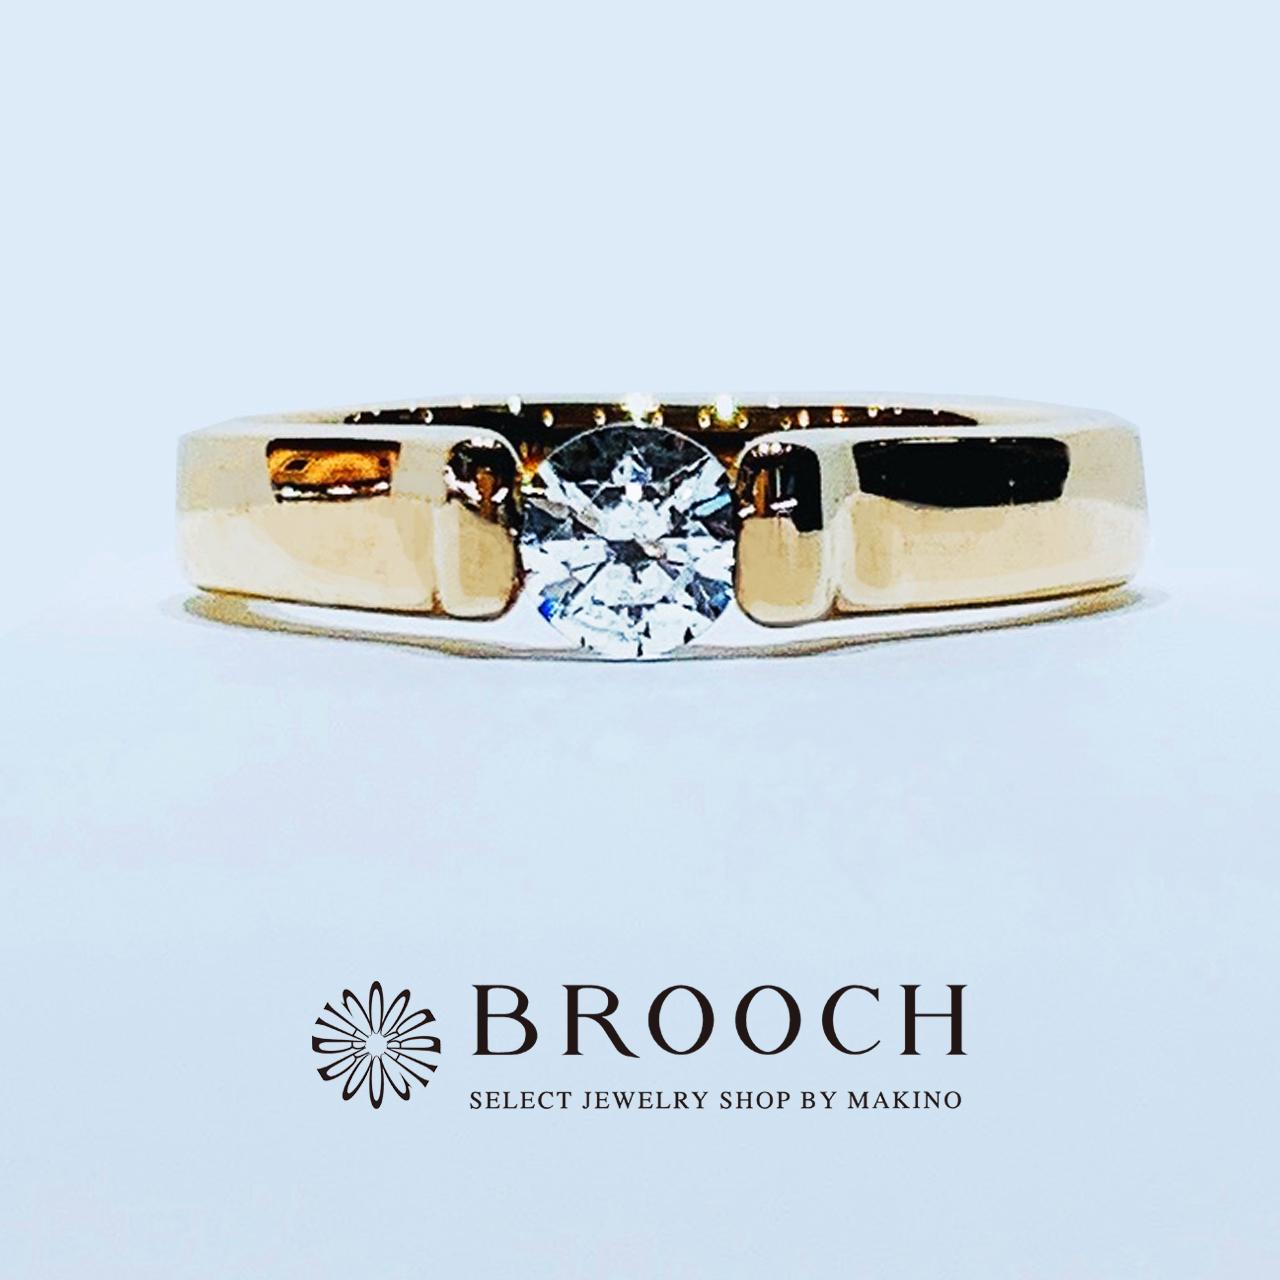 BROOCH 婚約指輪 エンゲージリング シンプル1石ストレートデザイン